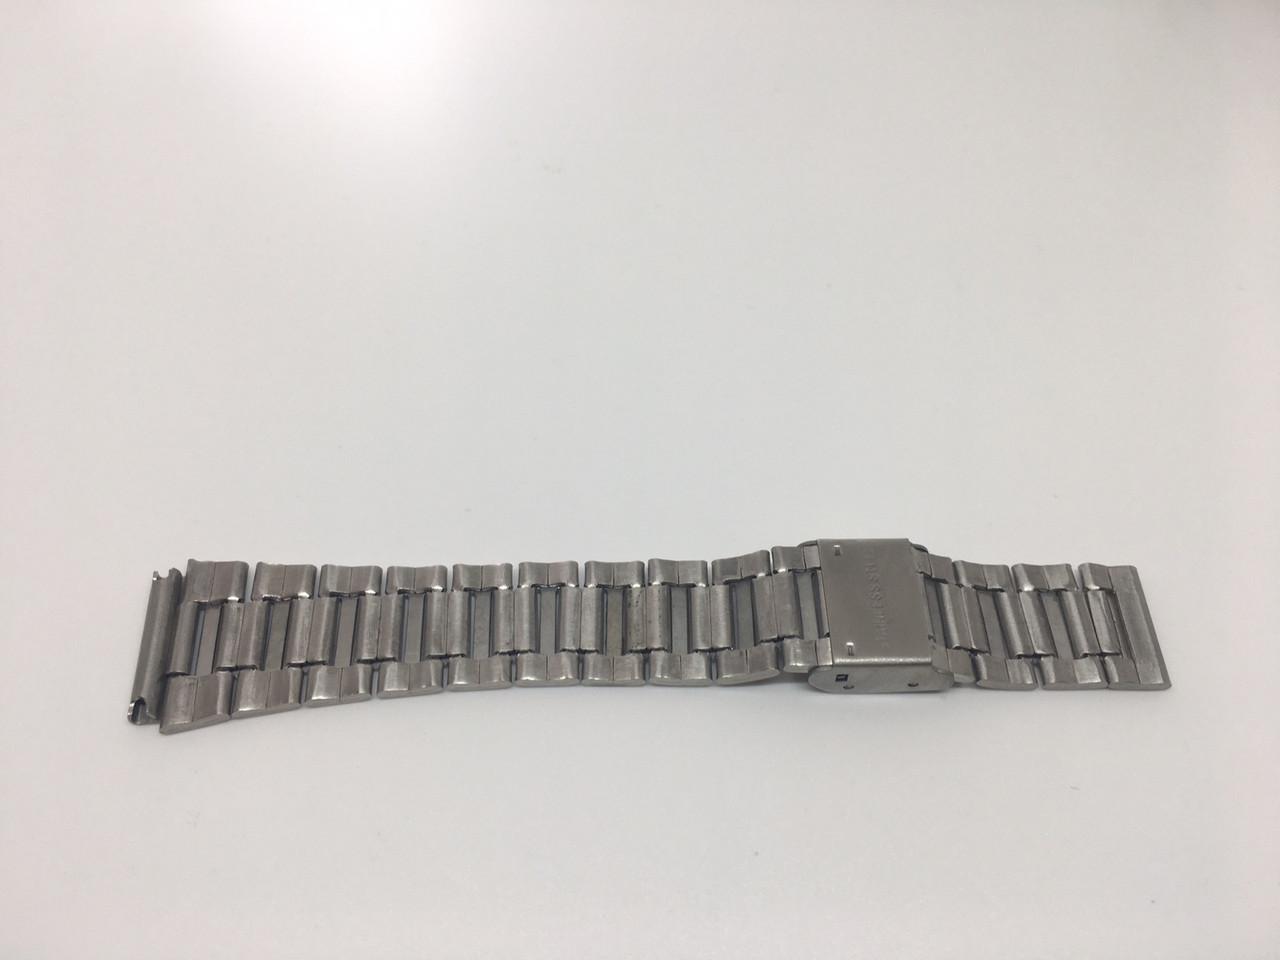 Ремешок на часы Skmei 1123 Серебристый БЕЗ НАЛОЖКИ!